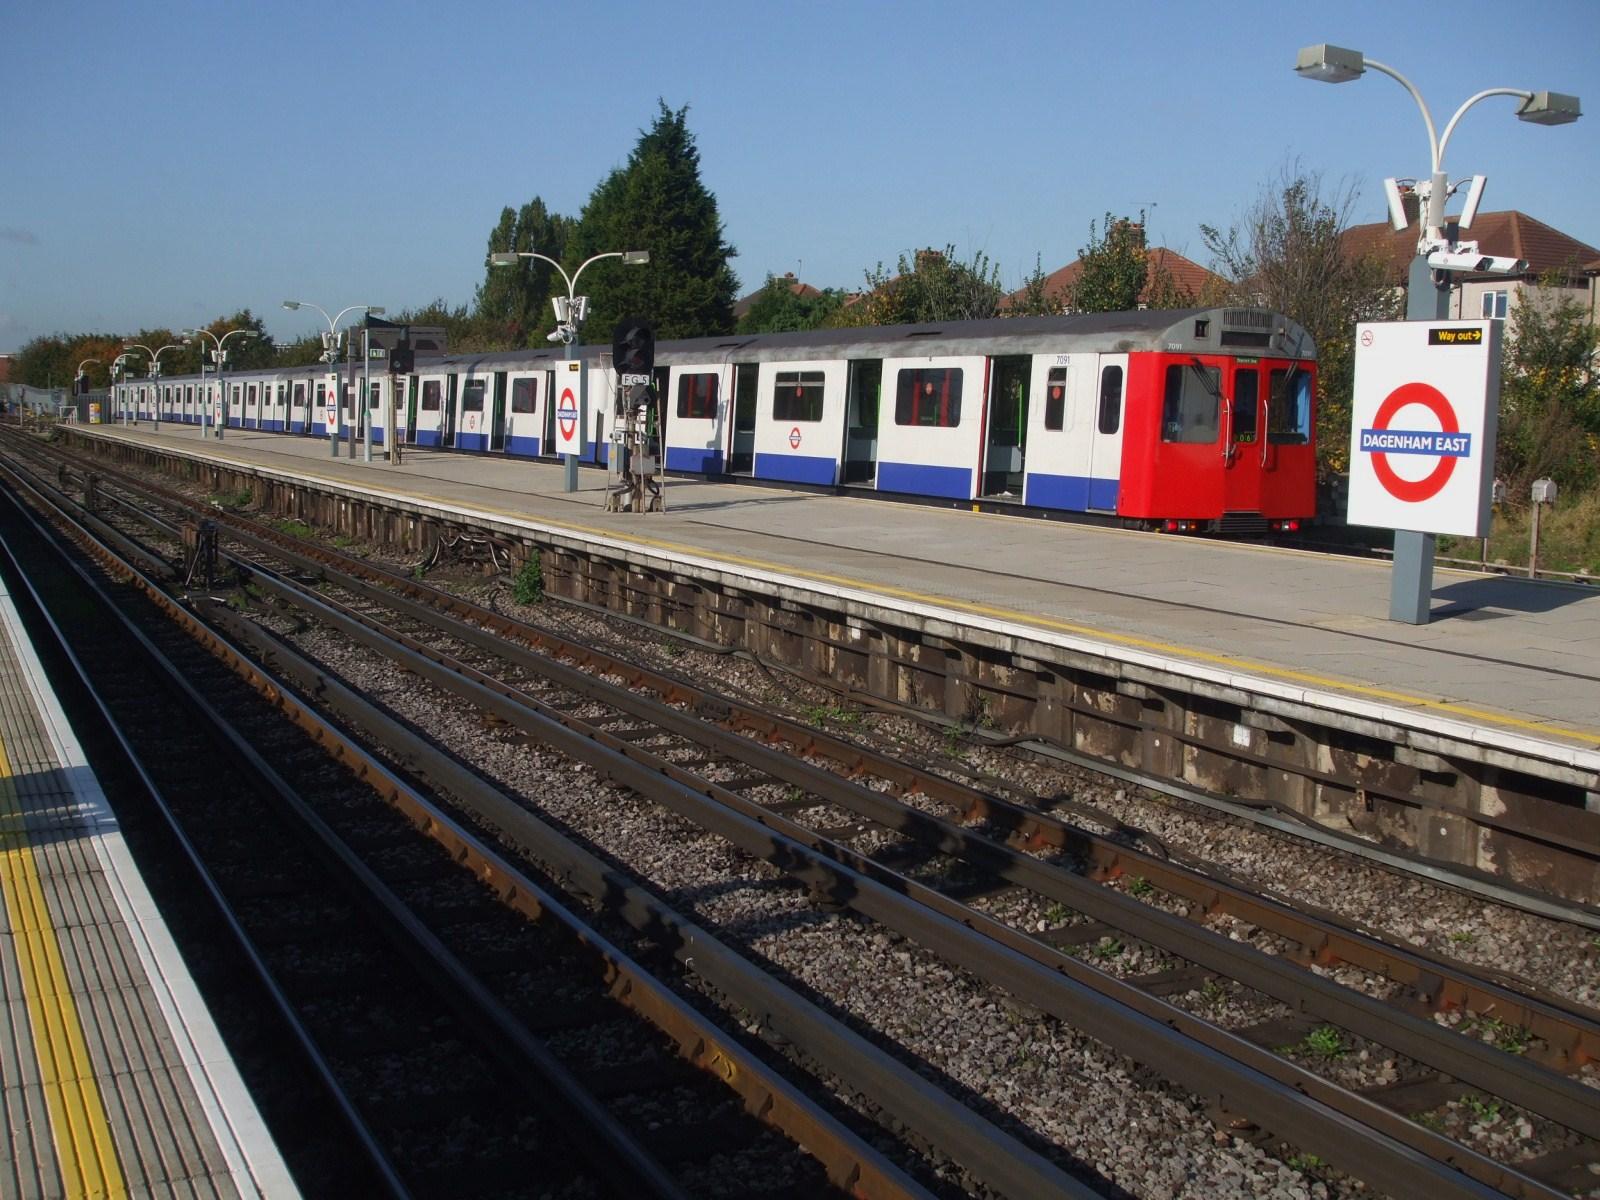 Dagenham East Underground Train Station